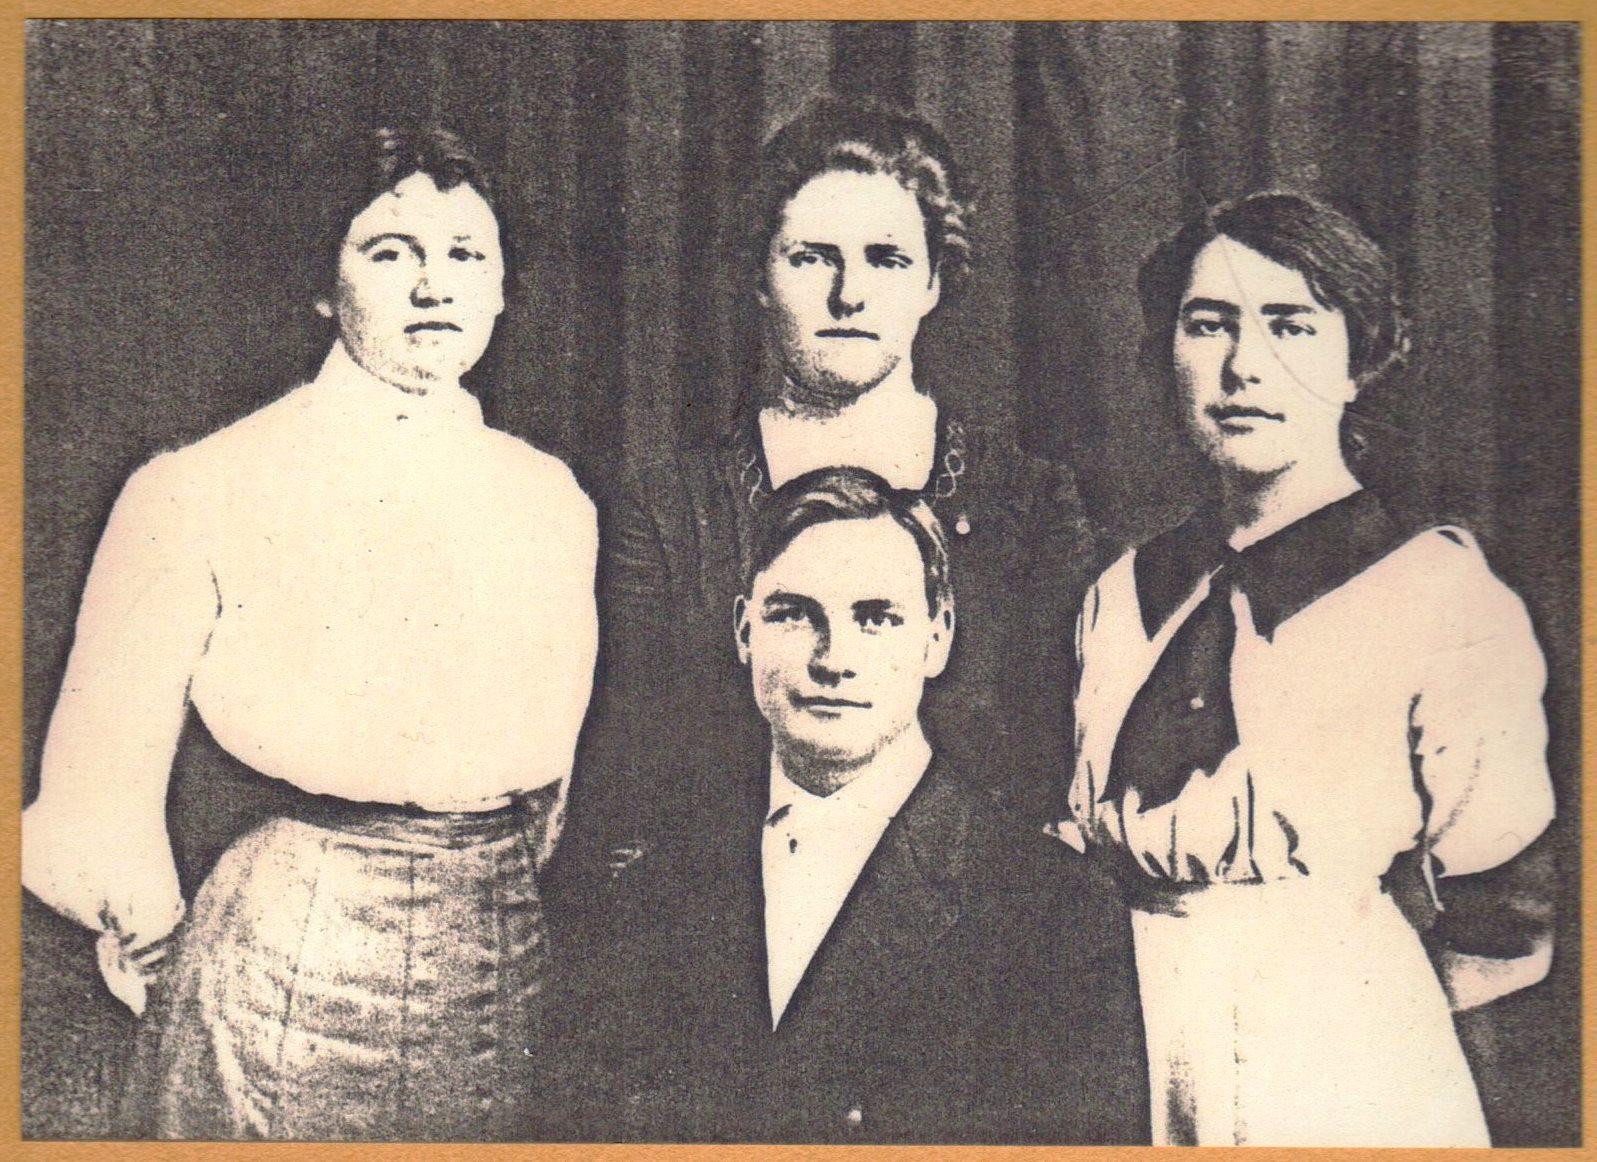 Mabel Arthur, Mary Cummings, Sarah King and Albert Wicklund.